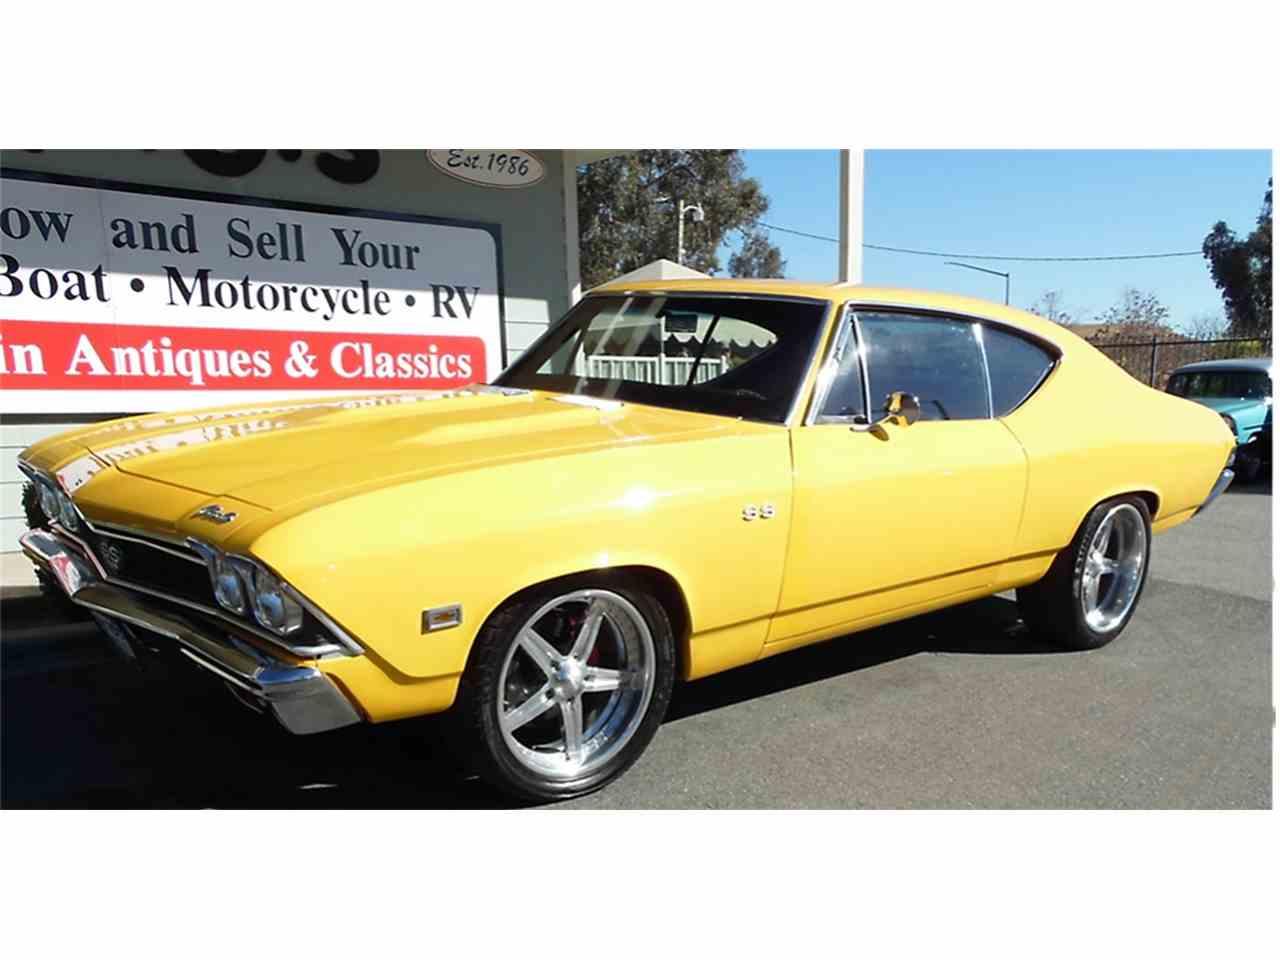 1968 Chevrolet Chevelle for Sale | ClassicCars.com | CC-1050540